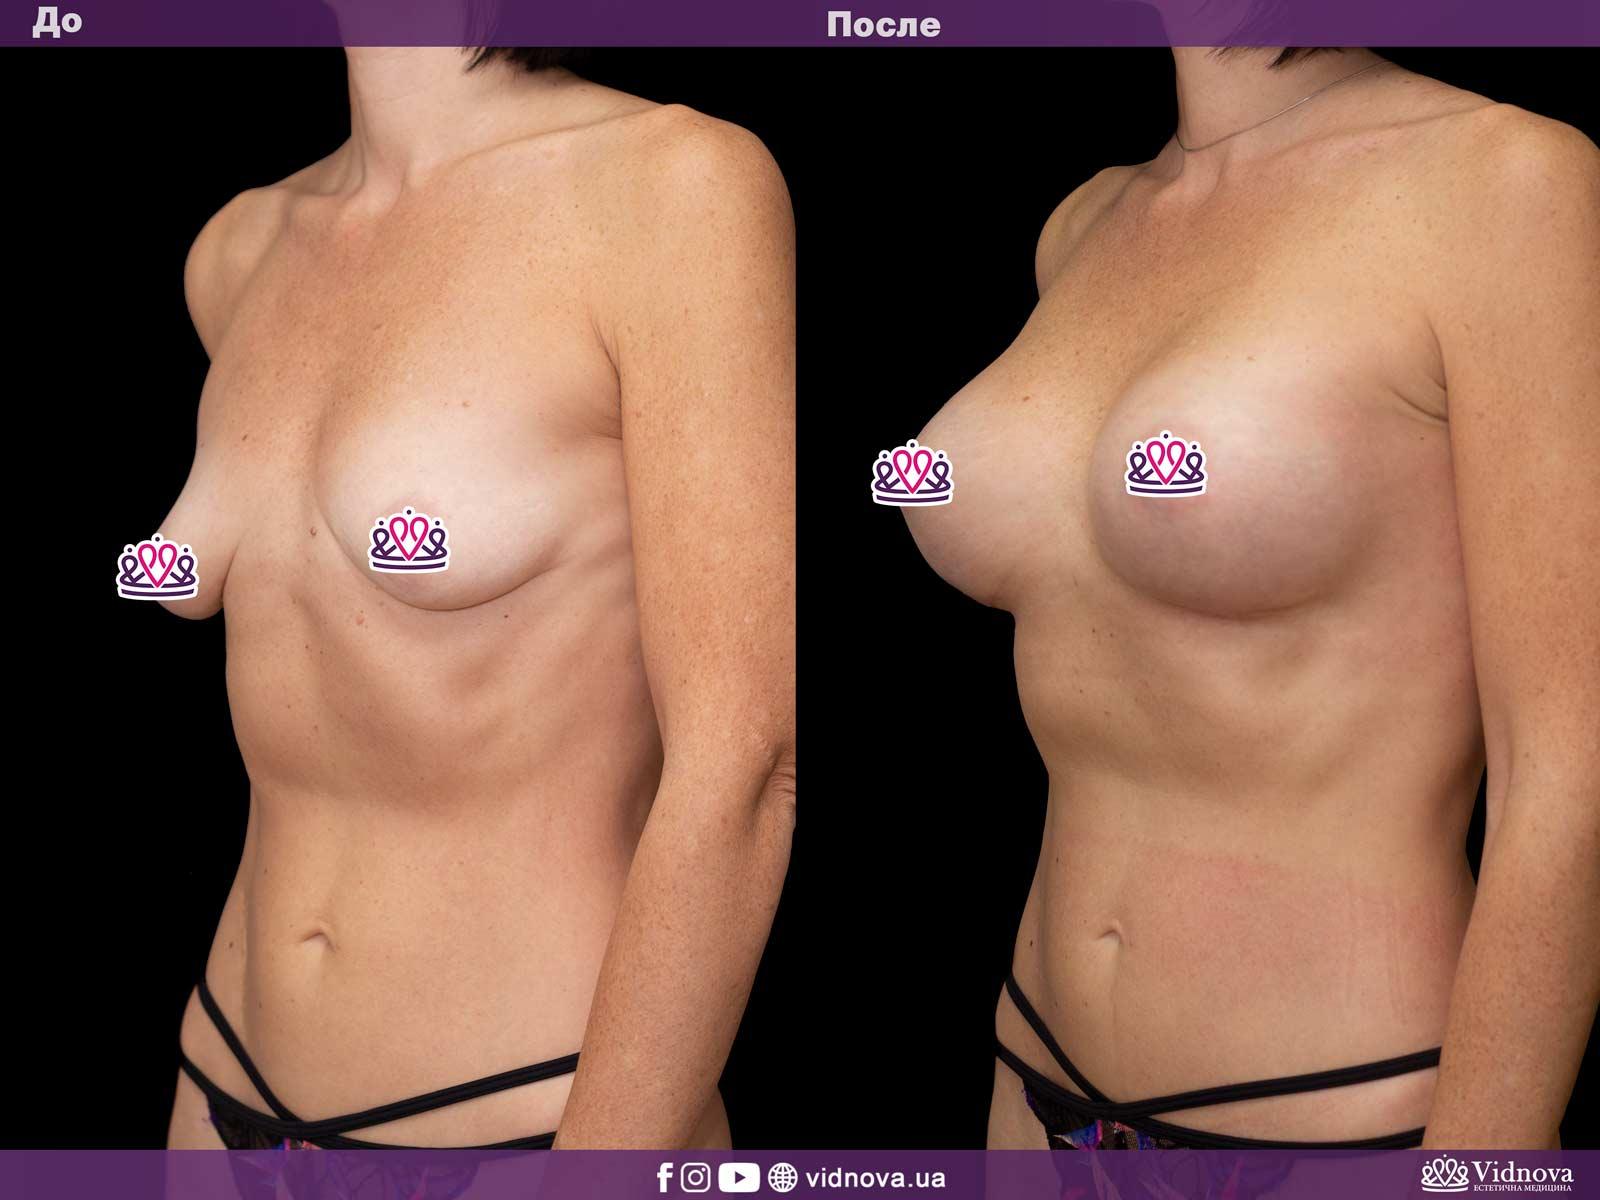 Увеличение груди: Фото ДО и ПОСЛЕ - Пример №32-2 - Клиника Vidnova